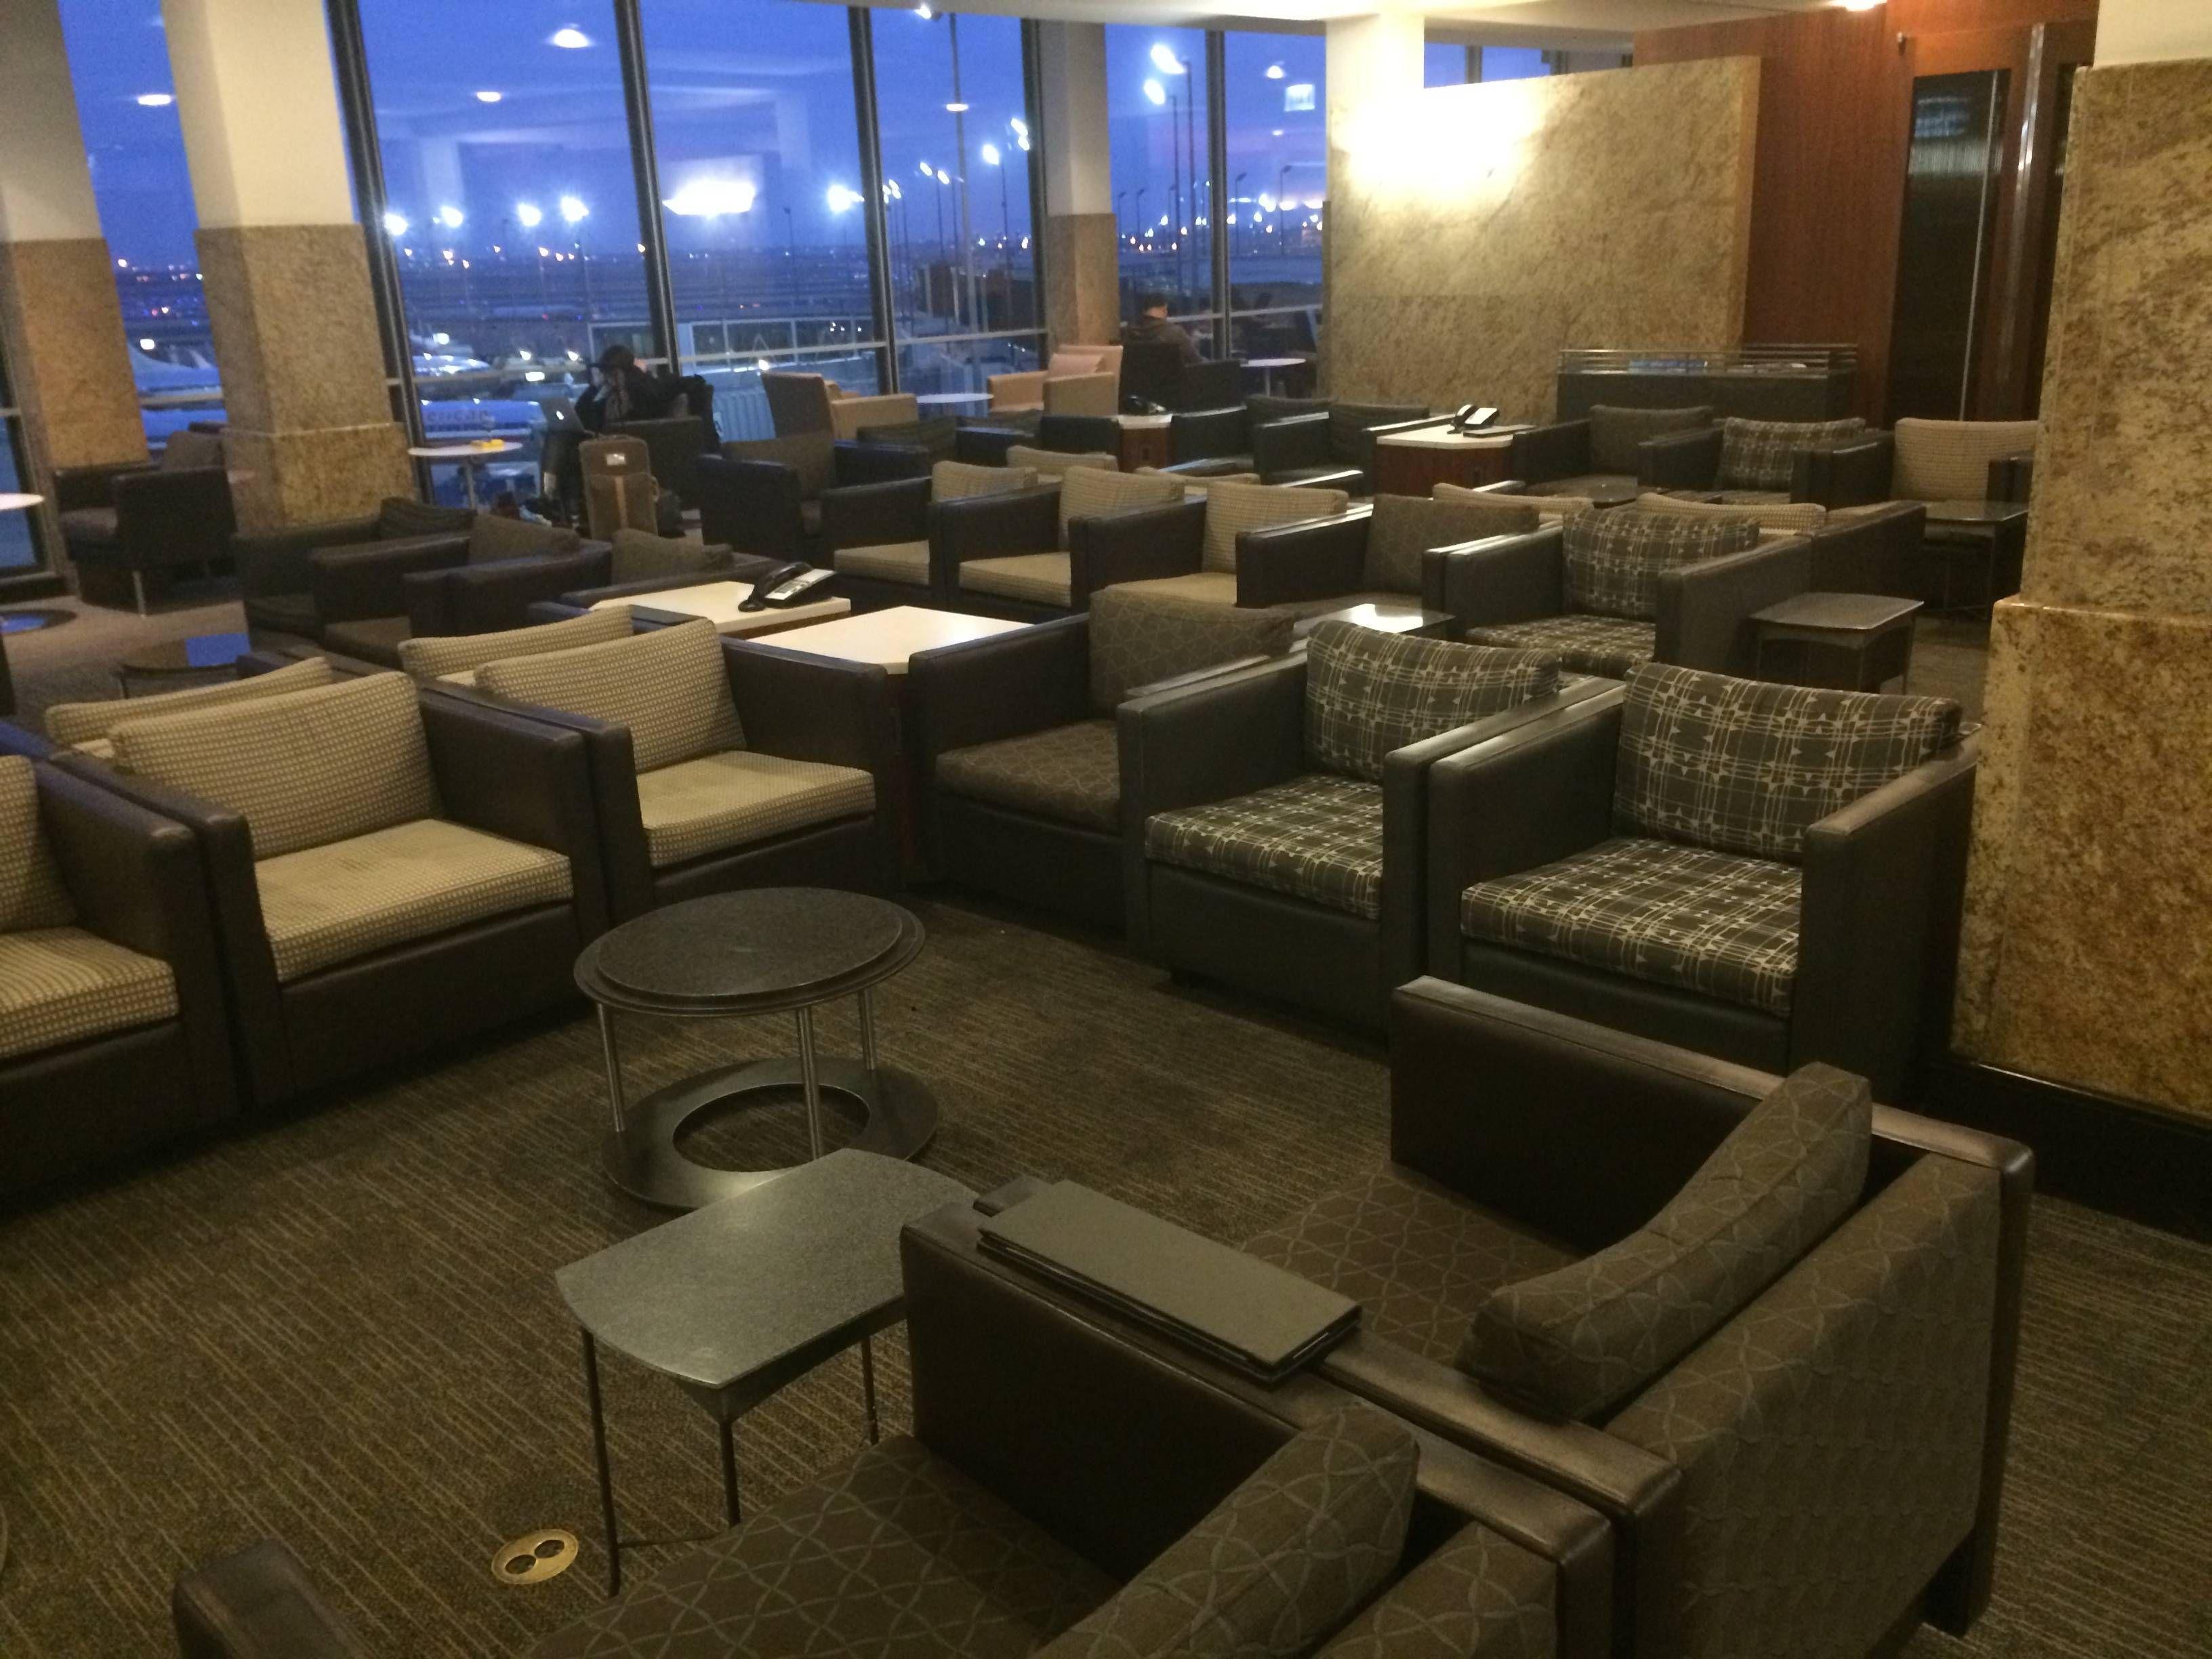 Admirals Club – Aeroporto de Chicago (ORD)